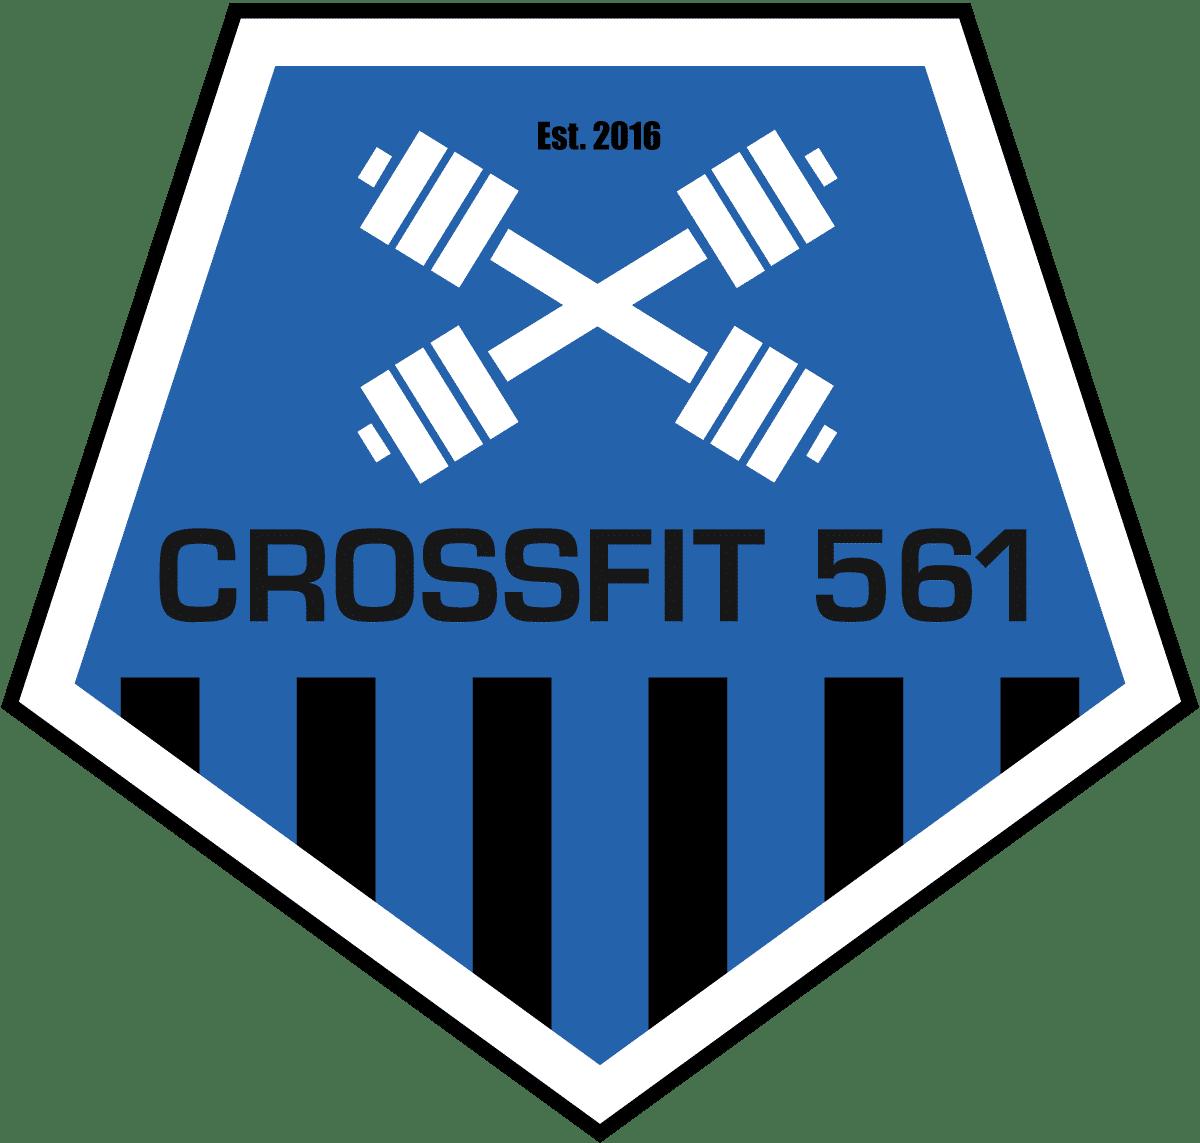 CrossFit 561